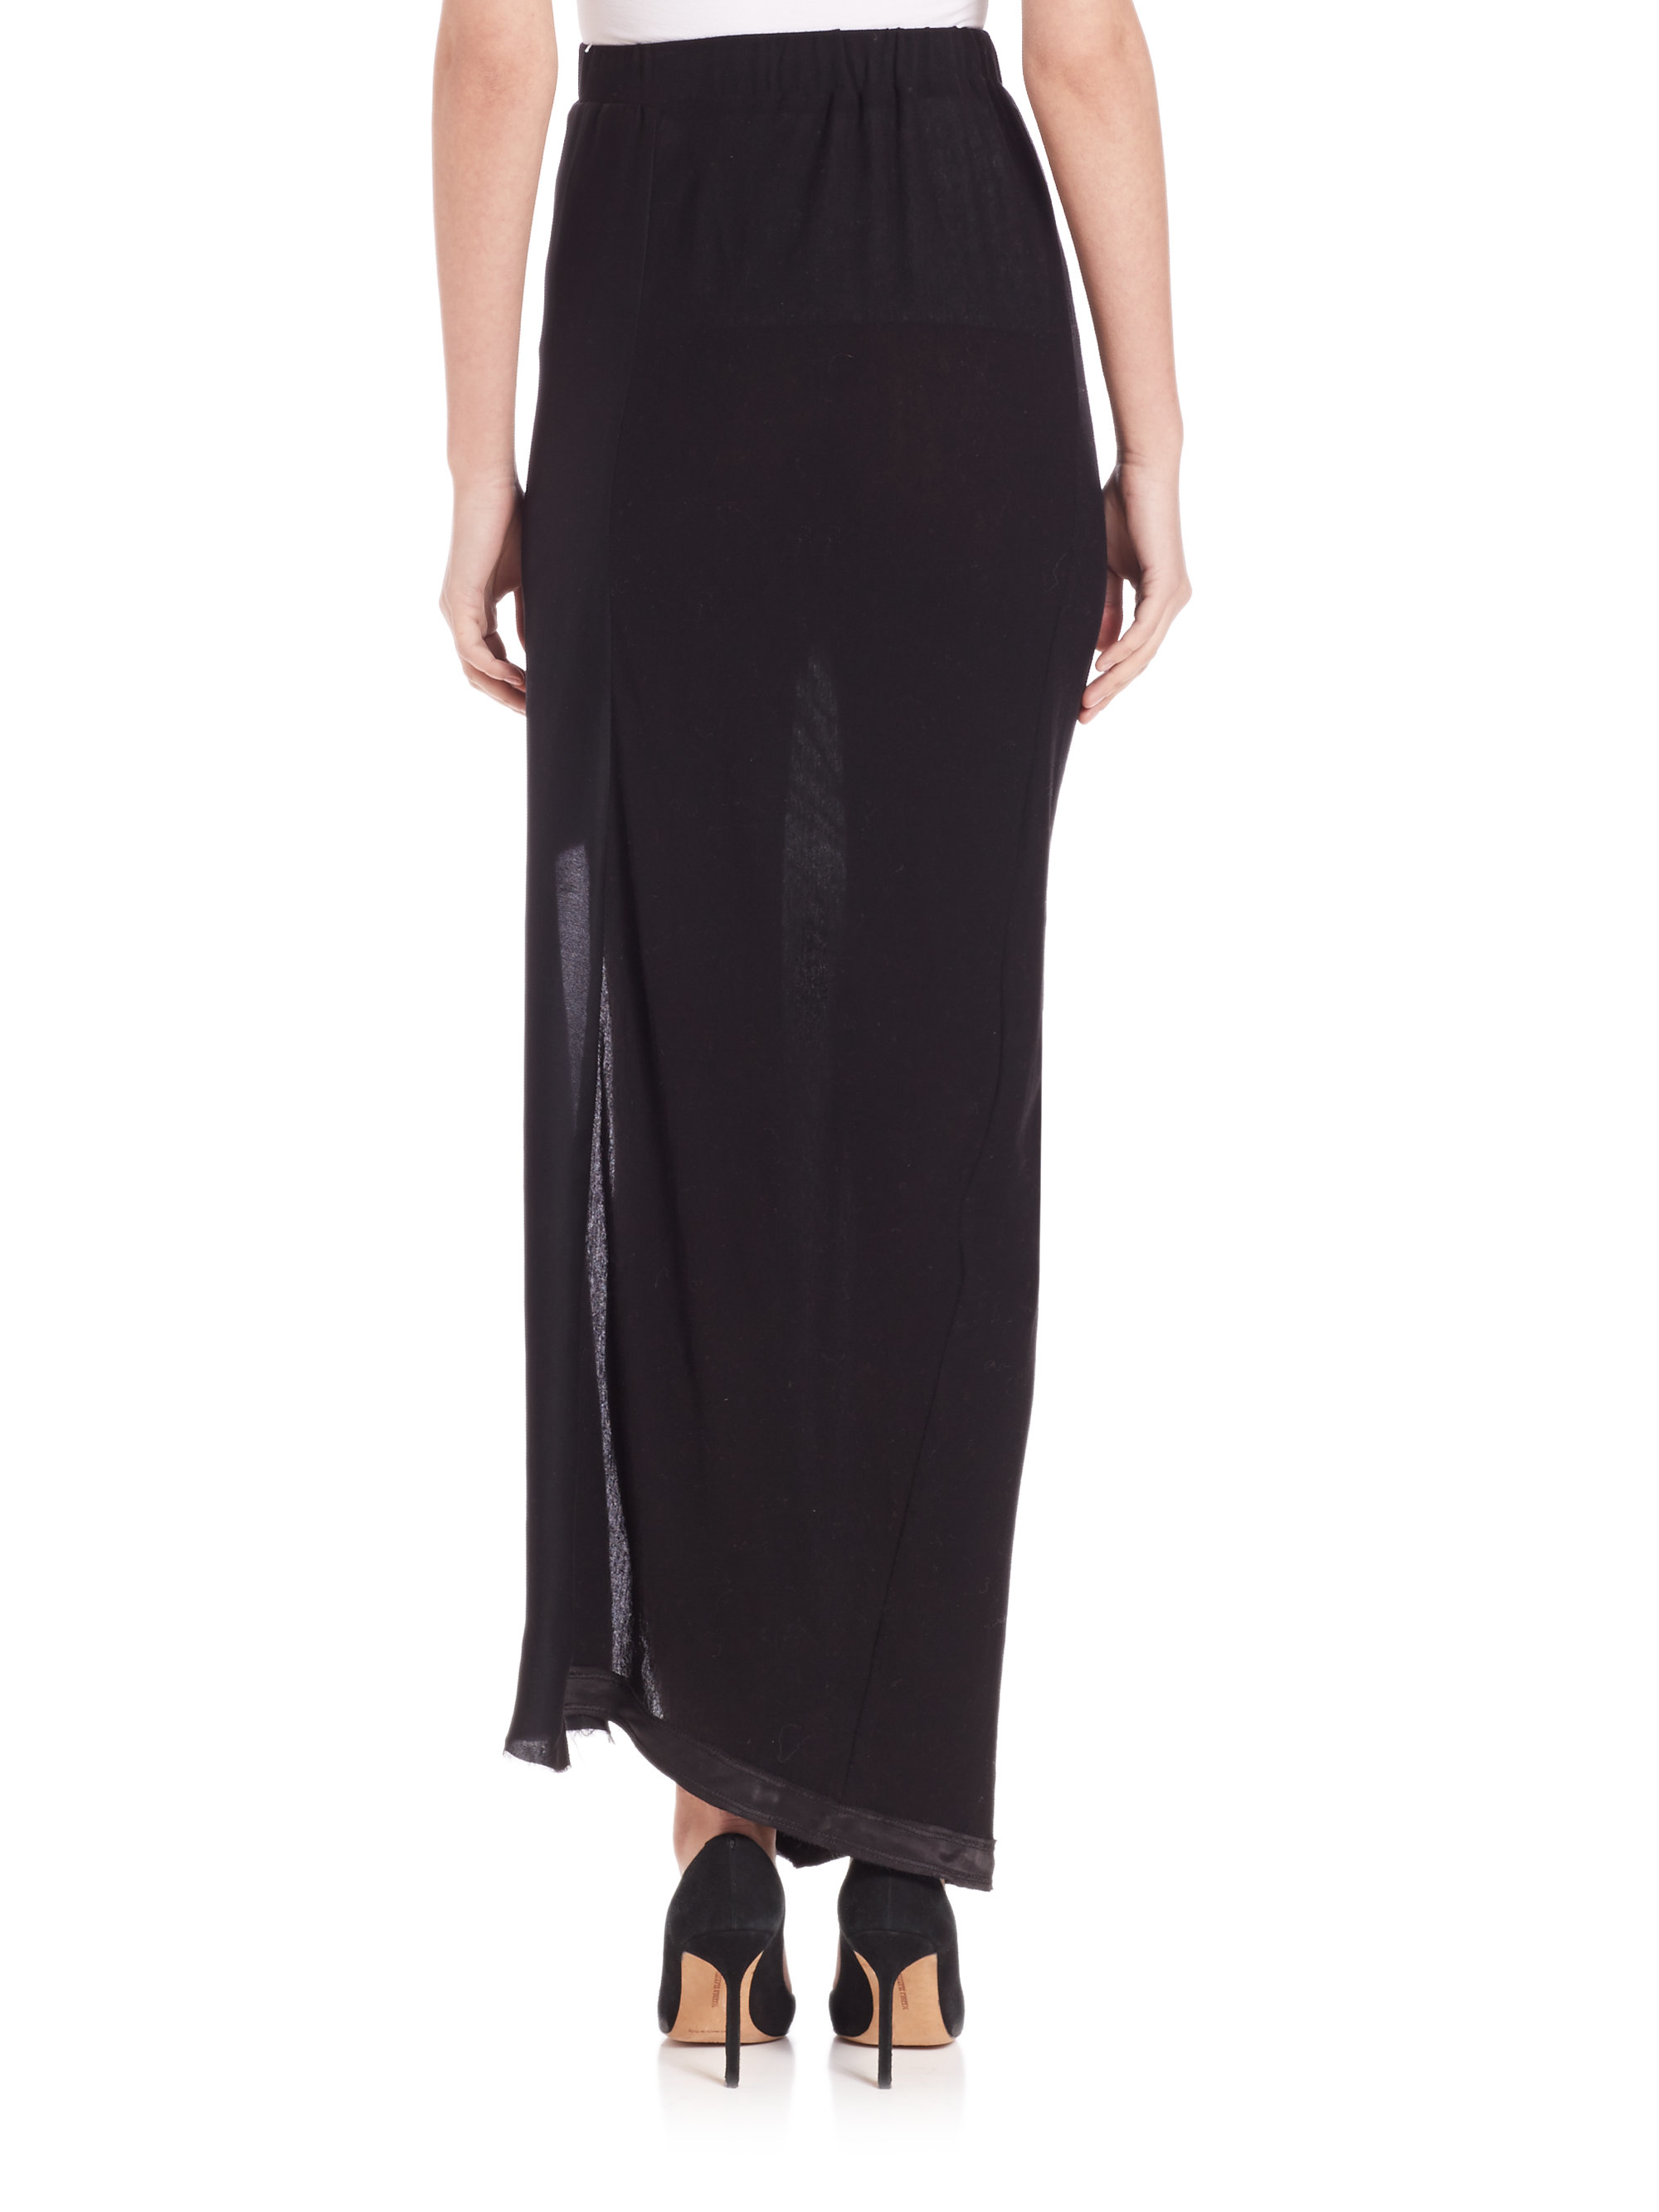 SKIRTS - Long skirts Rta 2018 New Get Free Shipping Really Sale Store dAyaORY2